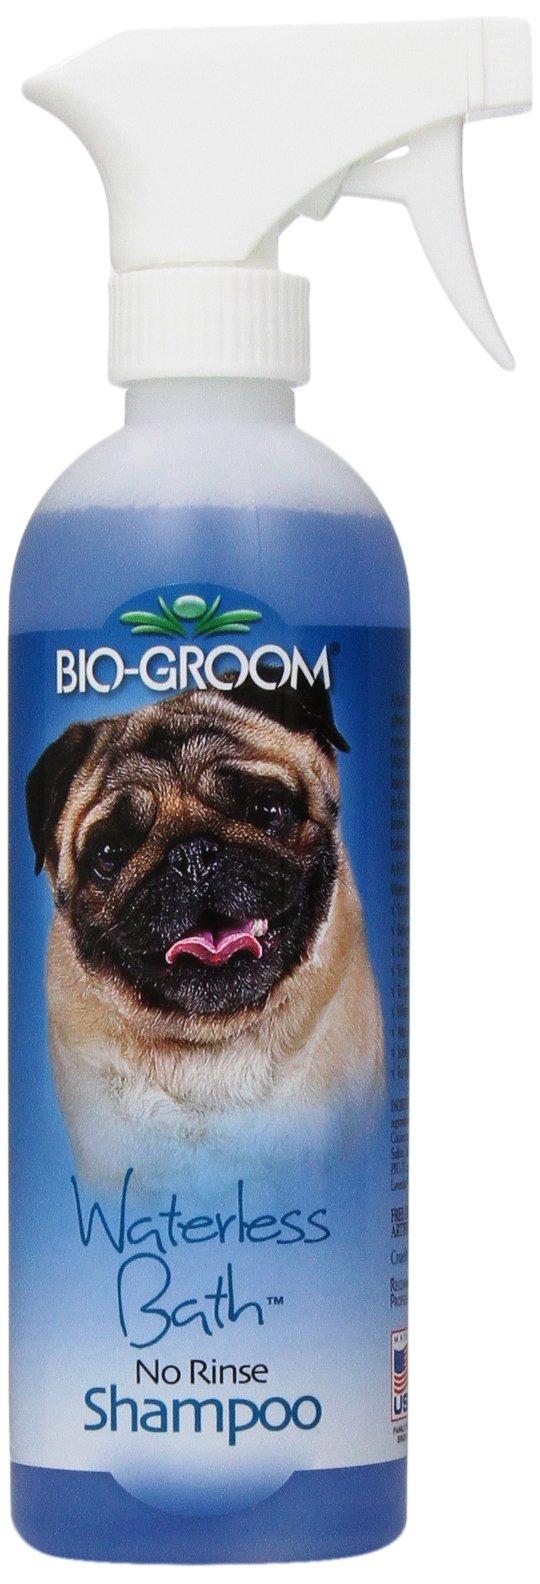 Bio-Groom Waterless Cats and Dog Bath Shampoo, 16-Ounce